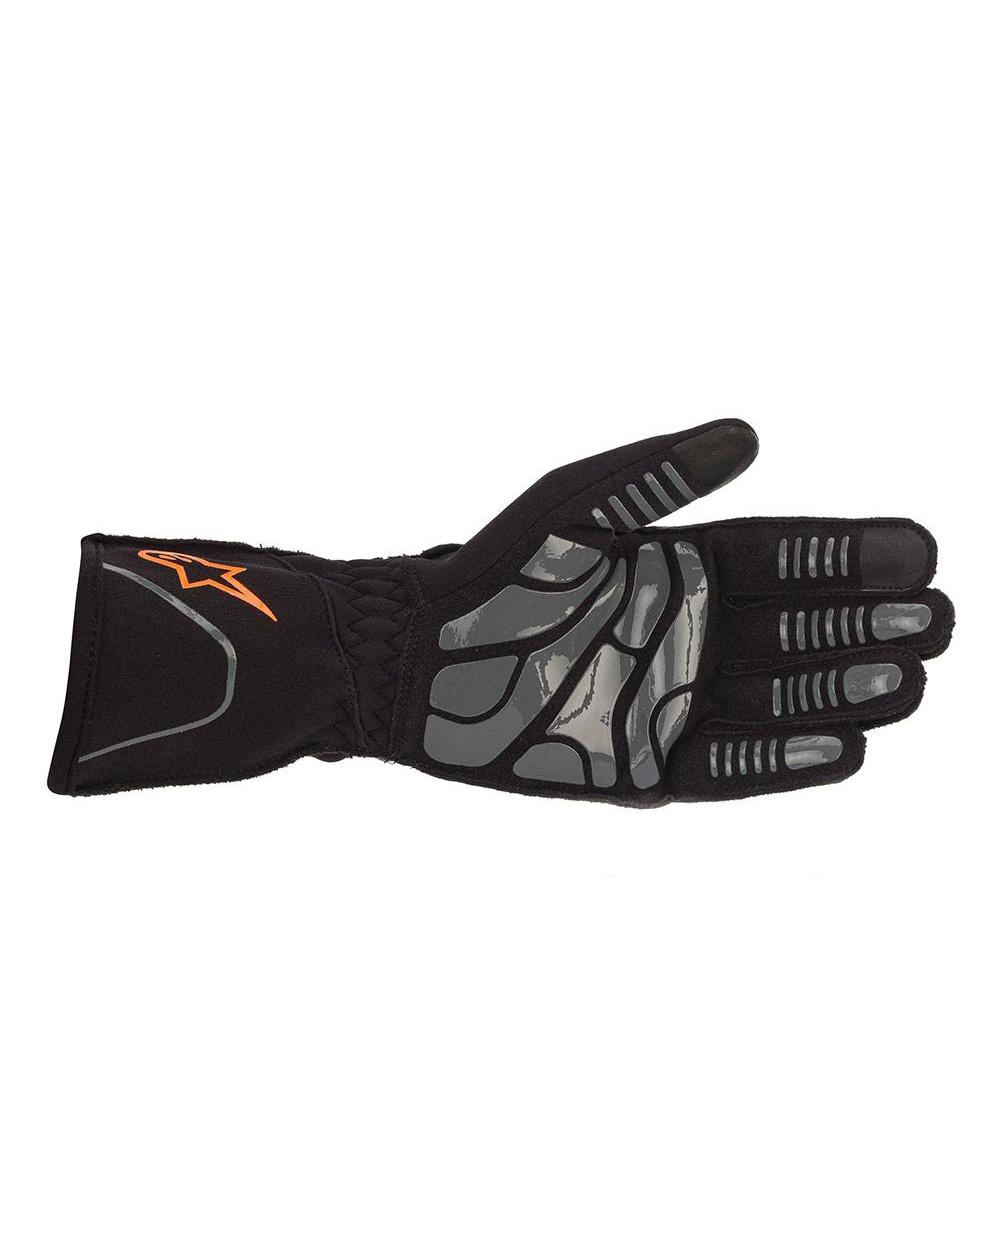 Alpinestars Tech-1KX V2 Noir Orange Fluo